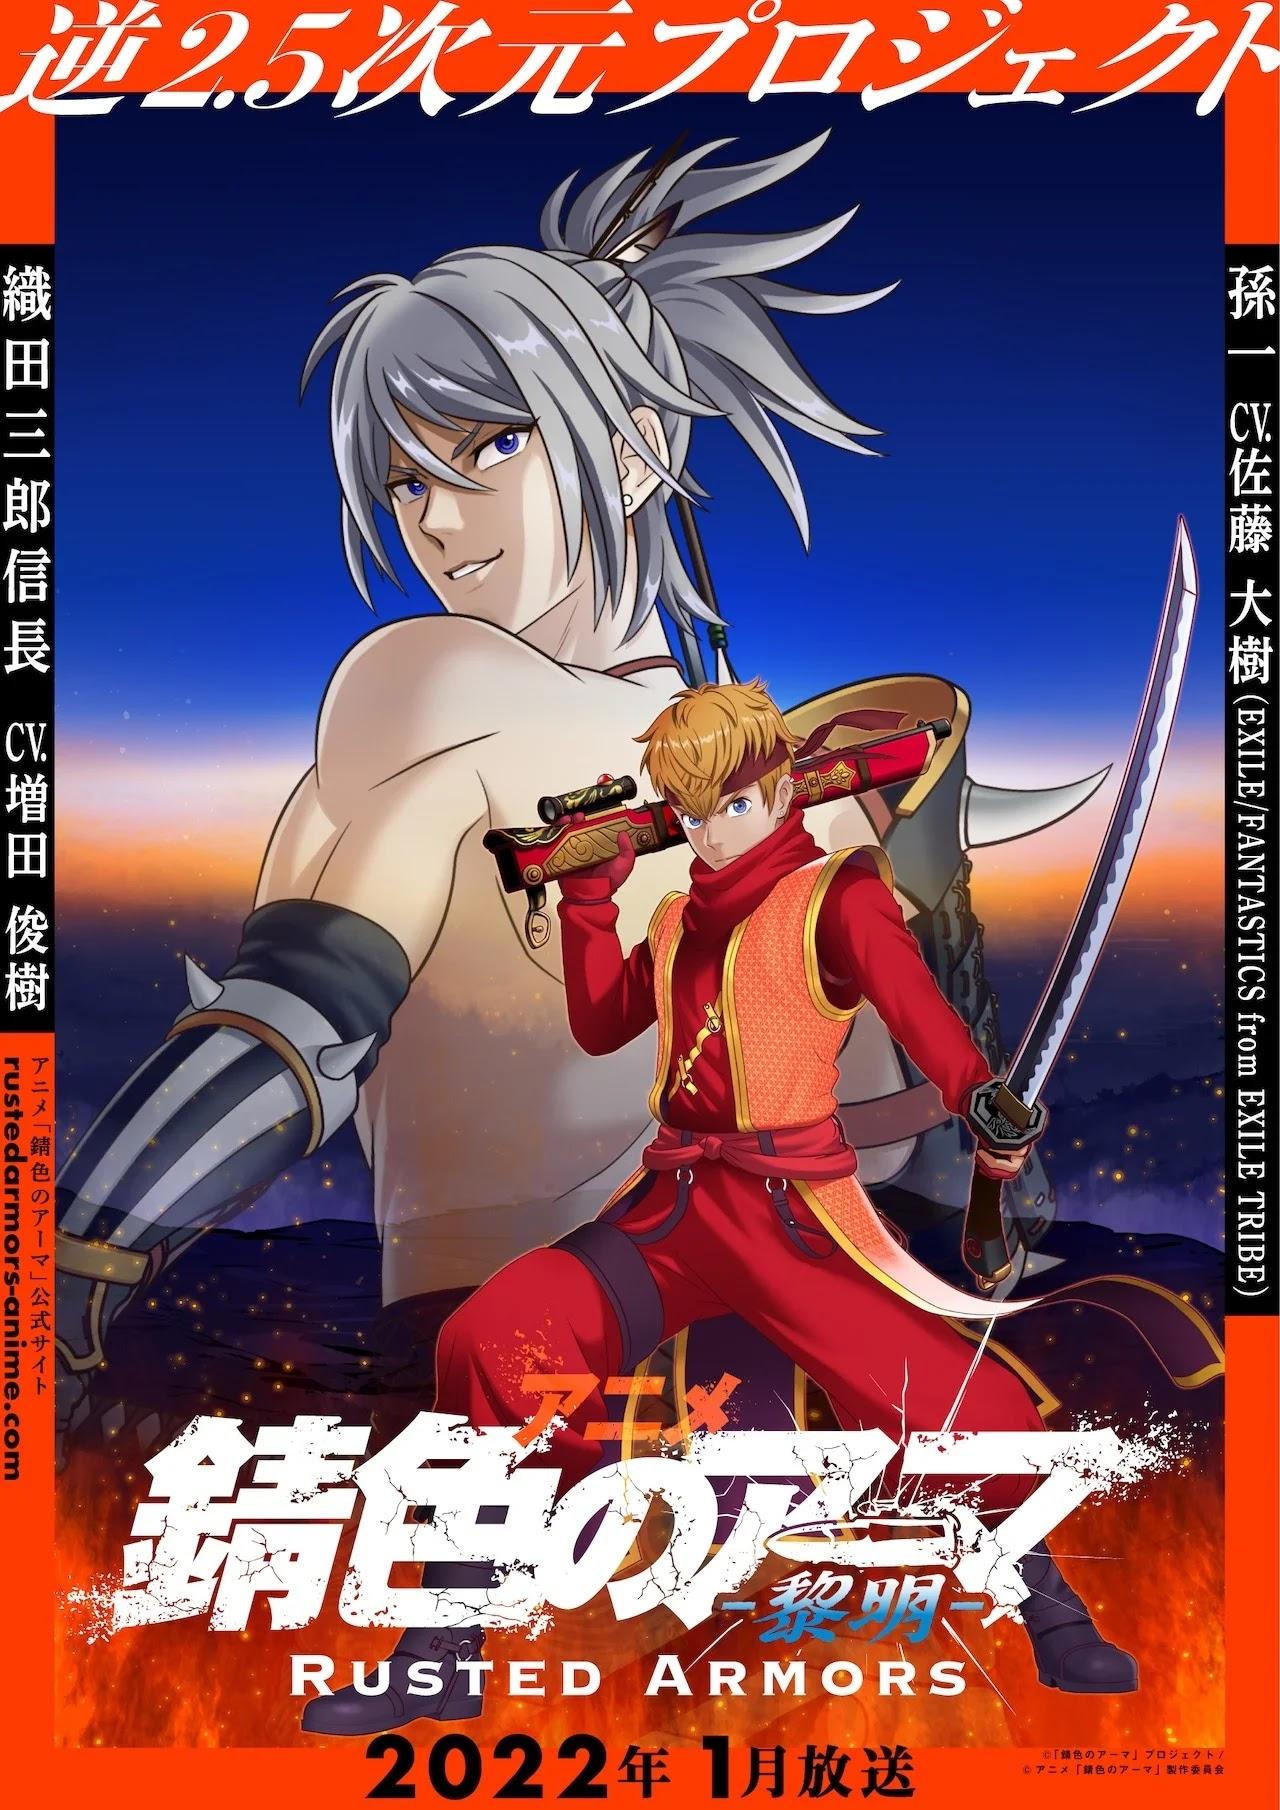 Anime Sabiiro no Armor: Reimei divulga seu Primeiro Vídeo Promocional